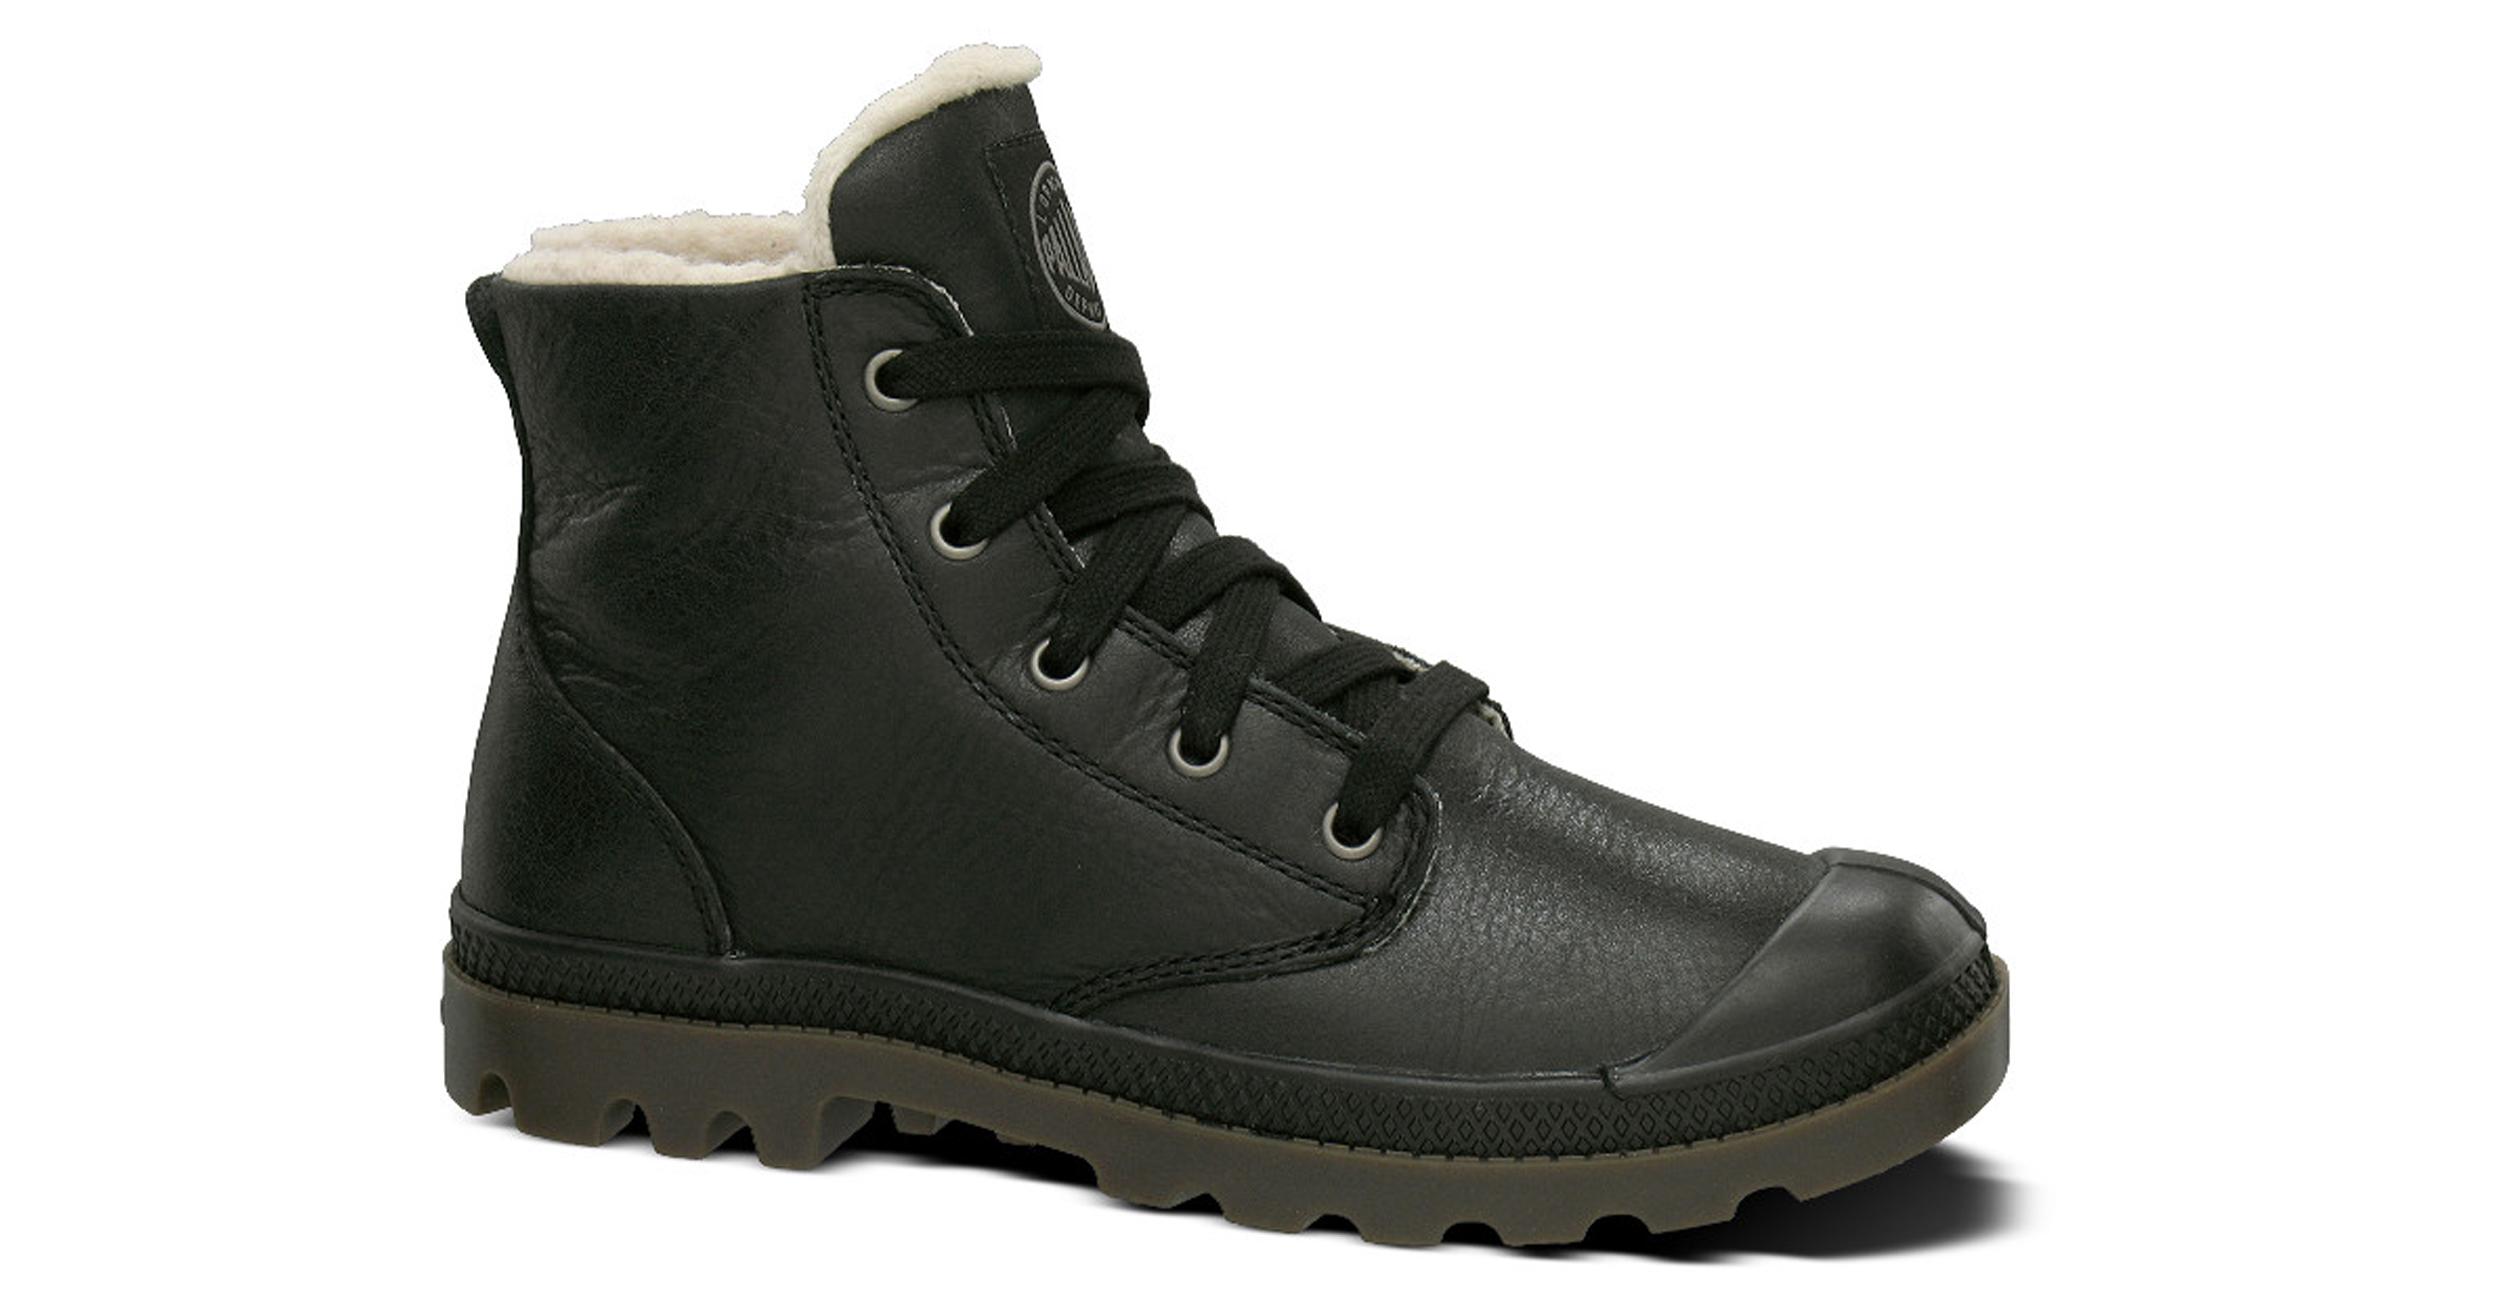 Womens Soft Walking Shoes Uk